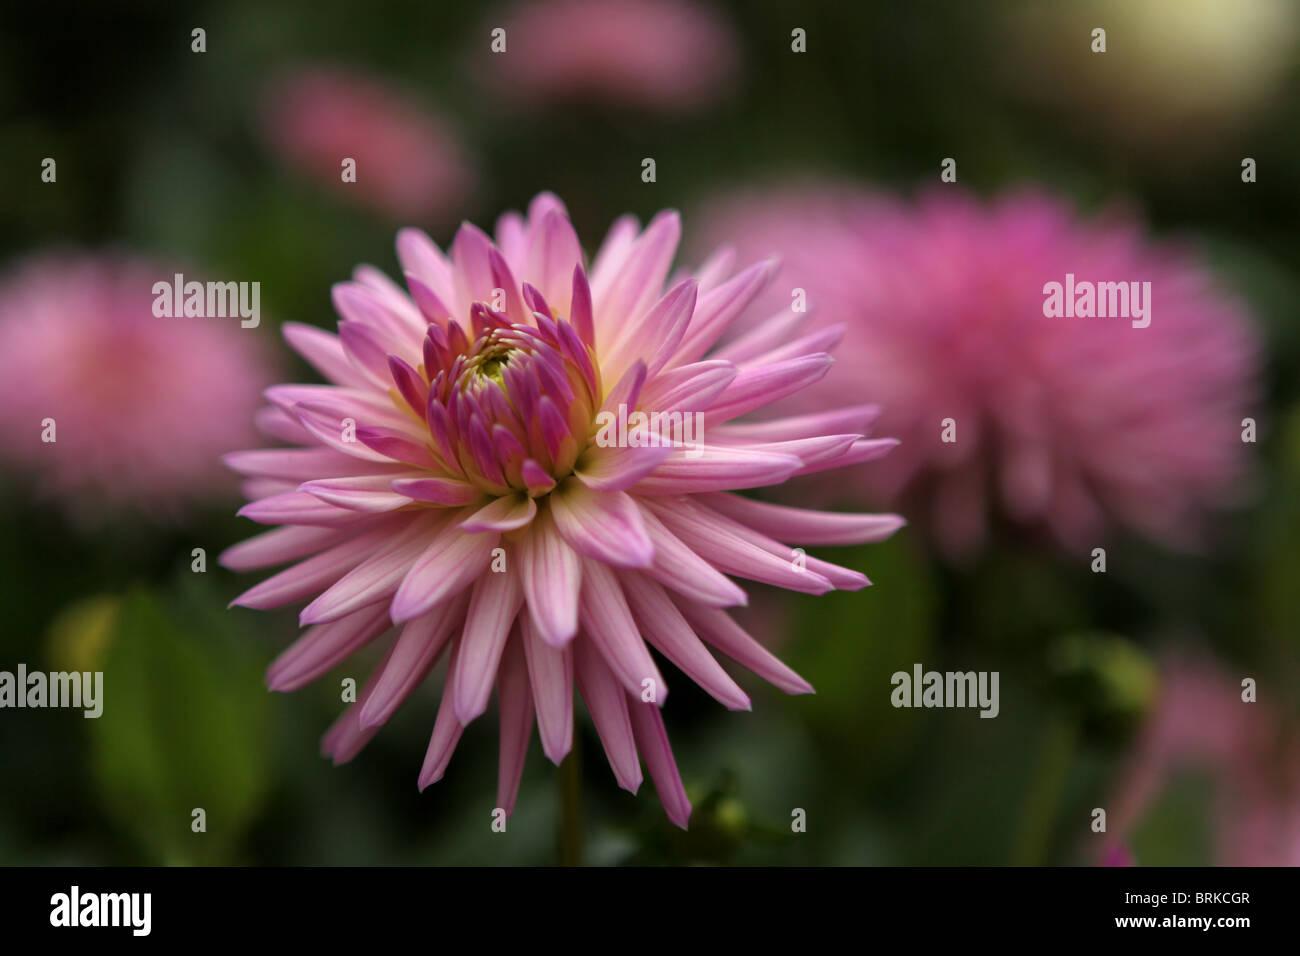 Dahlia (Deborah's Kiwi), decorative pink flower, cactus variety - Stock Image